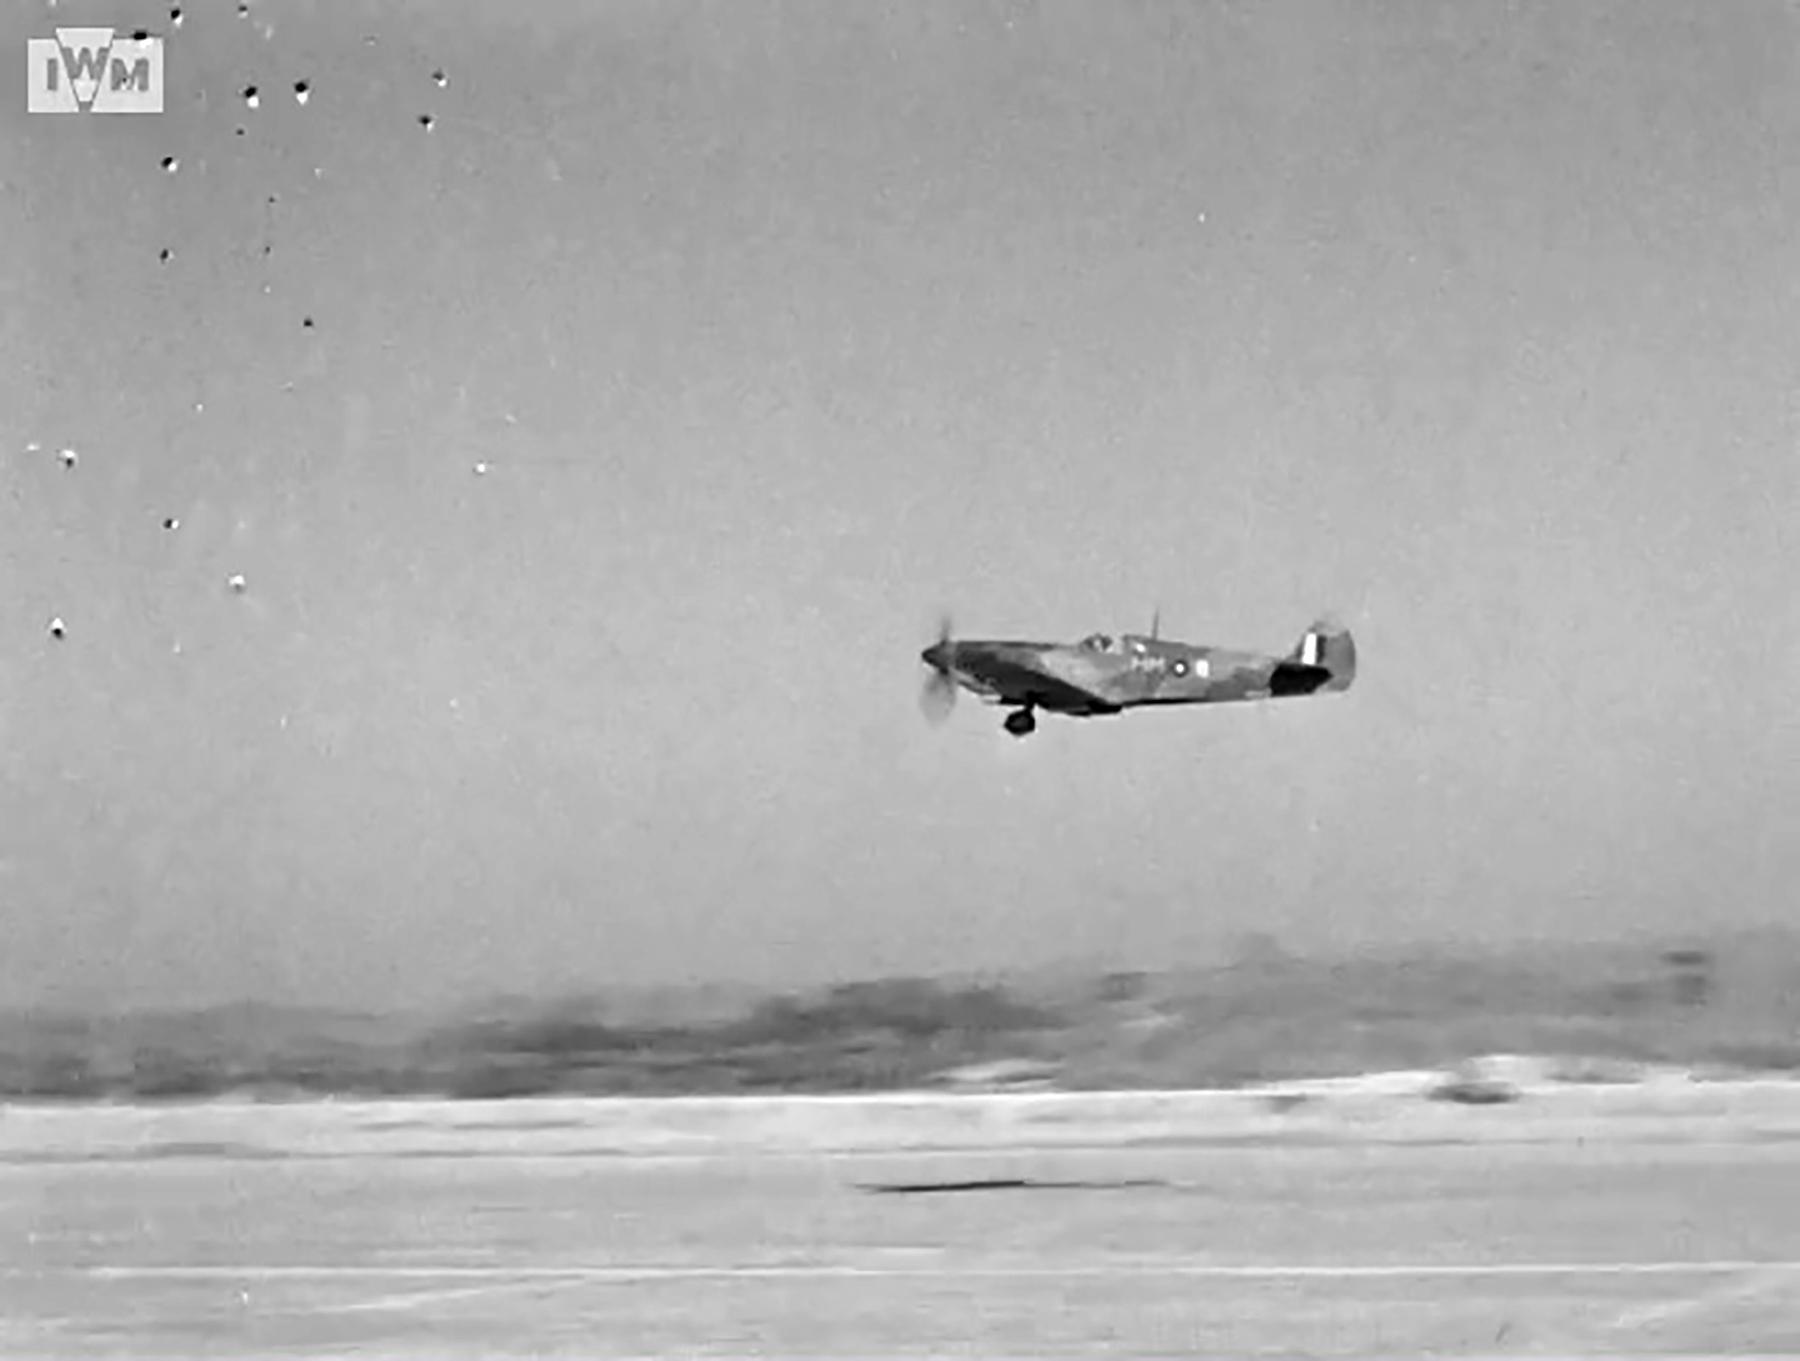 Spitfire VIII RAF 136Sqn HM taking off from Rumkhapalong operating over Burma CBI 1944 IWM 02